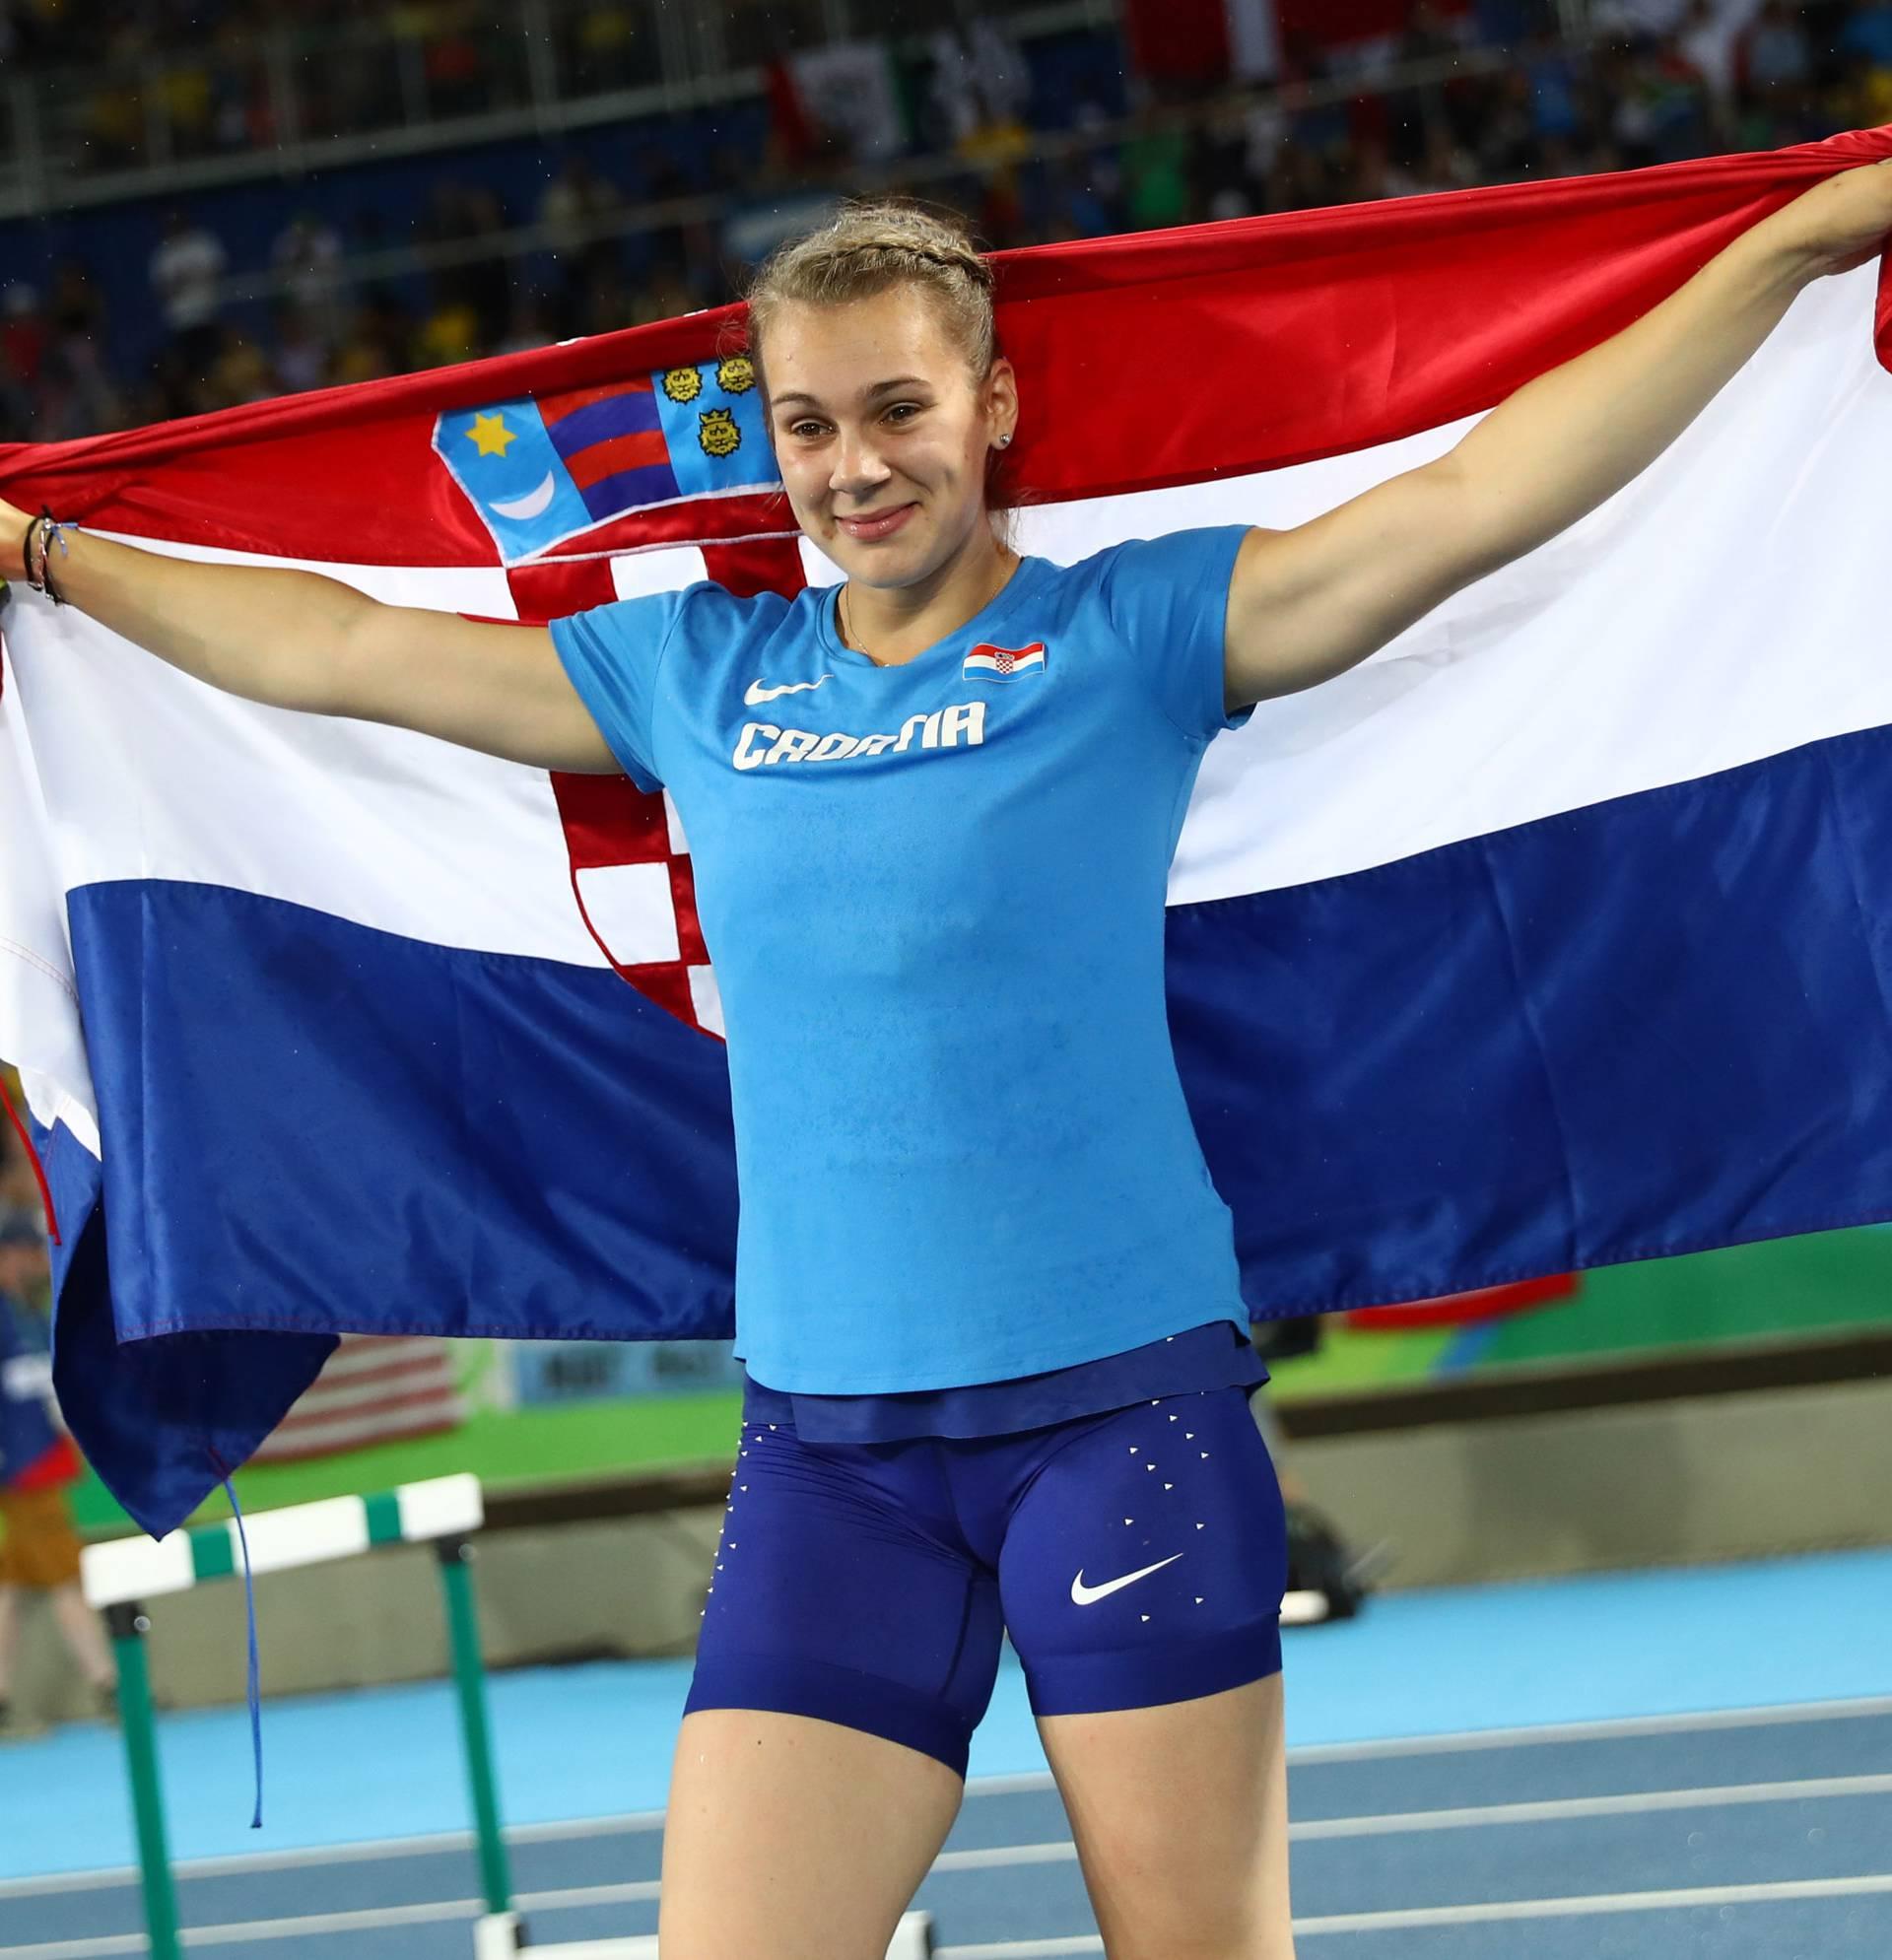 Athletics - Women's Javelin Throw Final